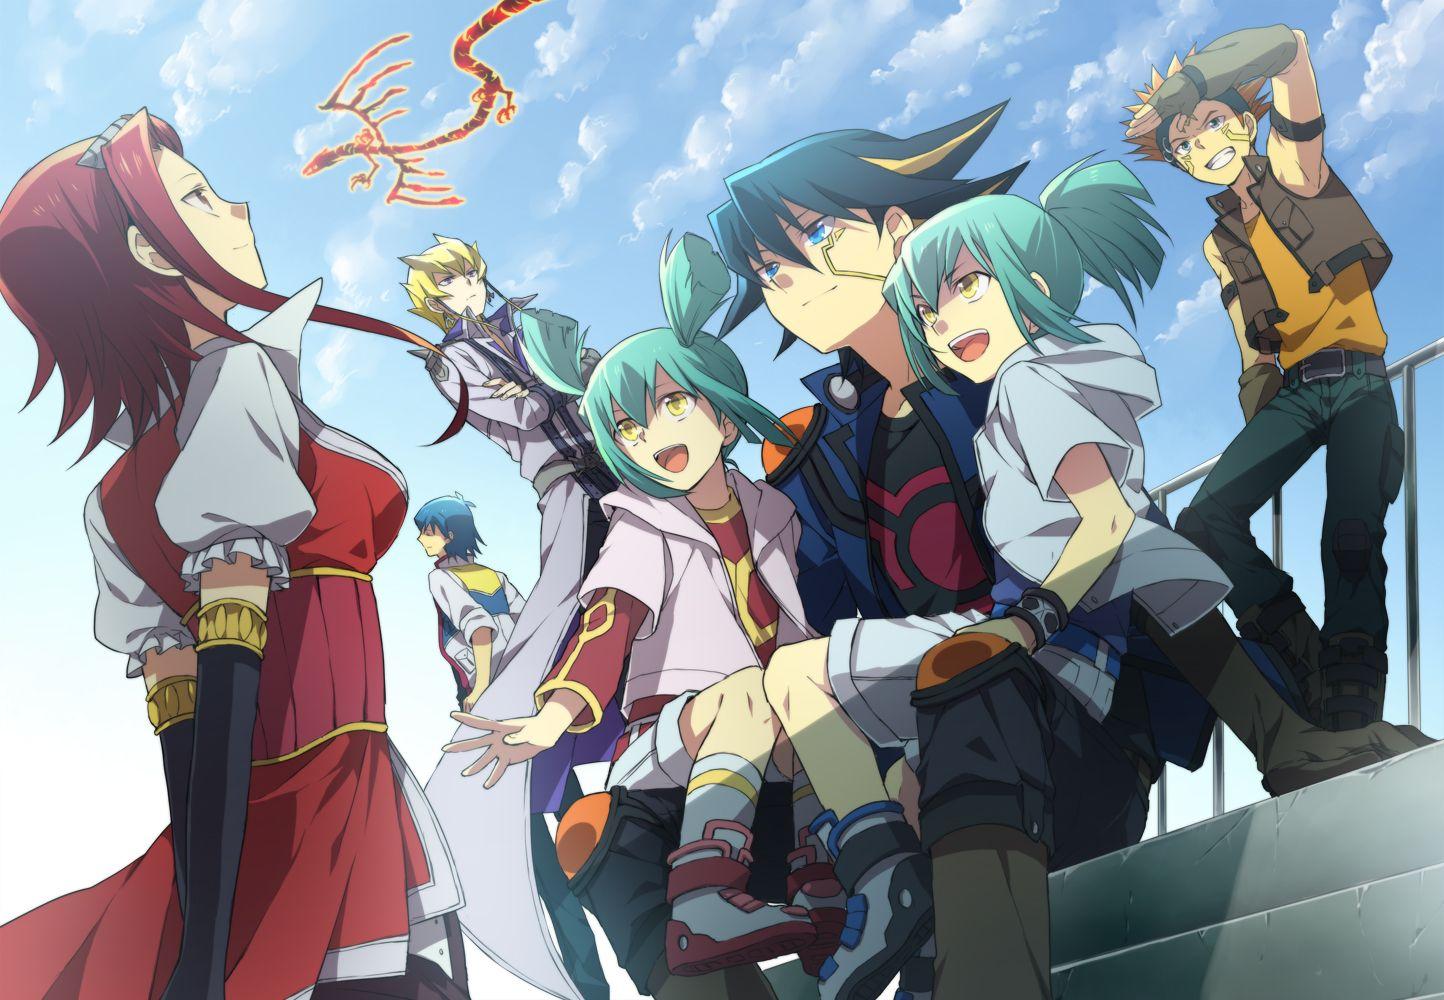 Pin by Ashley Doran on YUGIOH! 5ds Anime, Yugioh